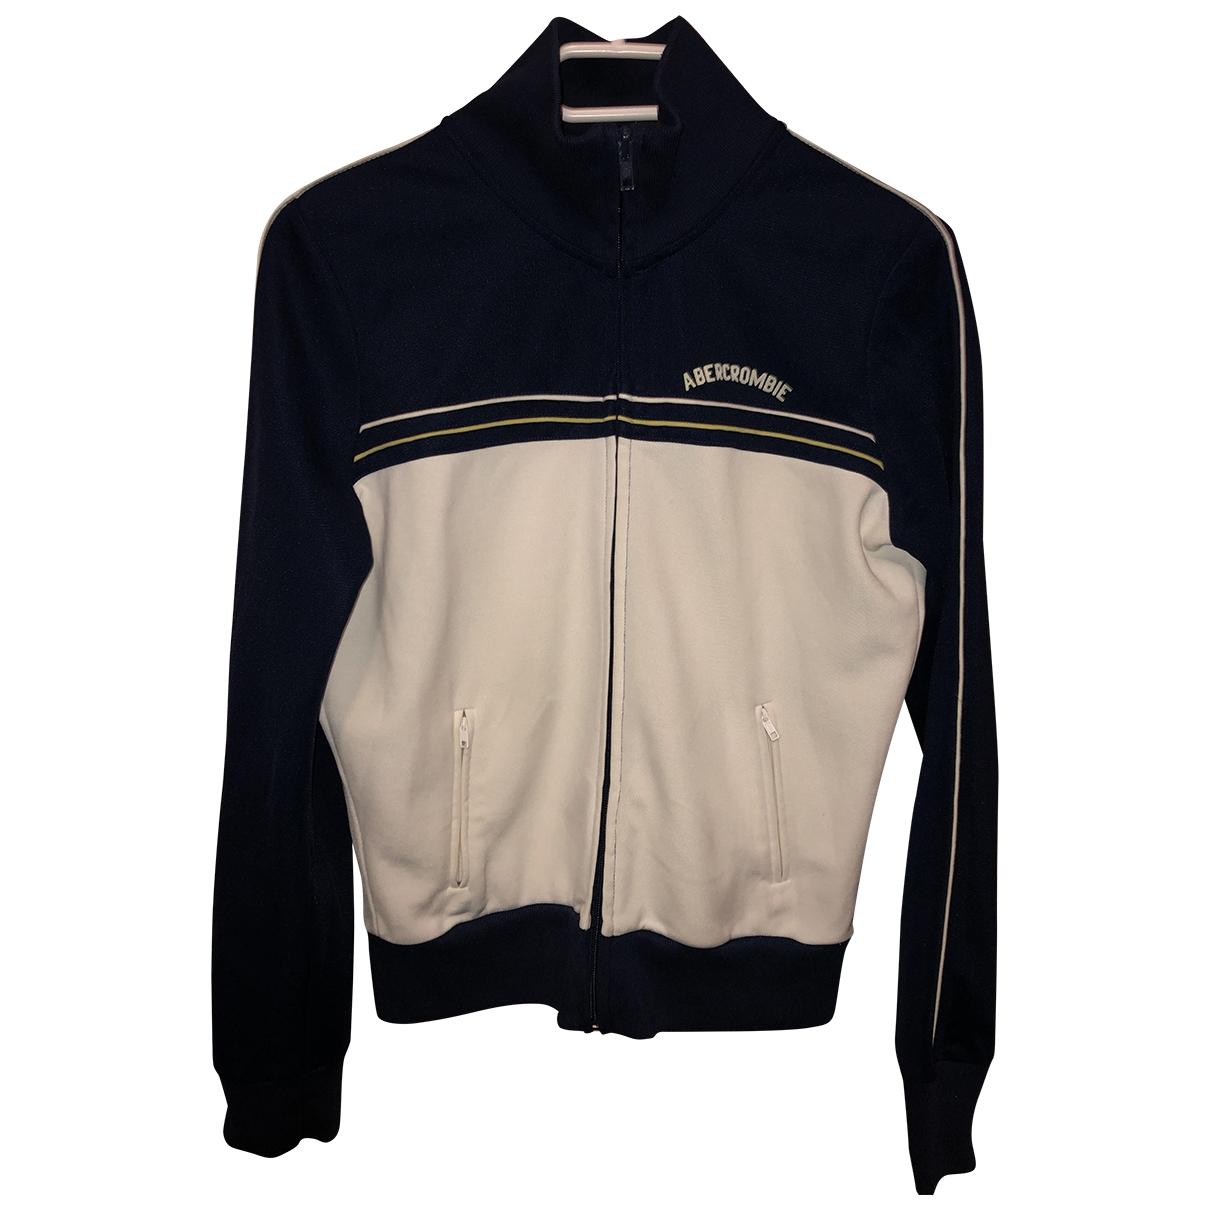 Abercrombie & Fitch \N Blue Cotton jacket for Women L International